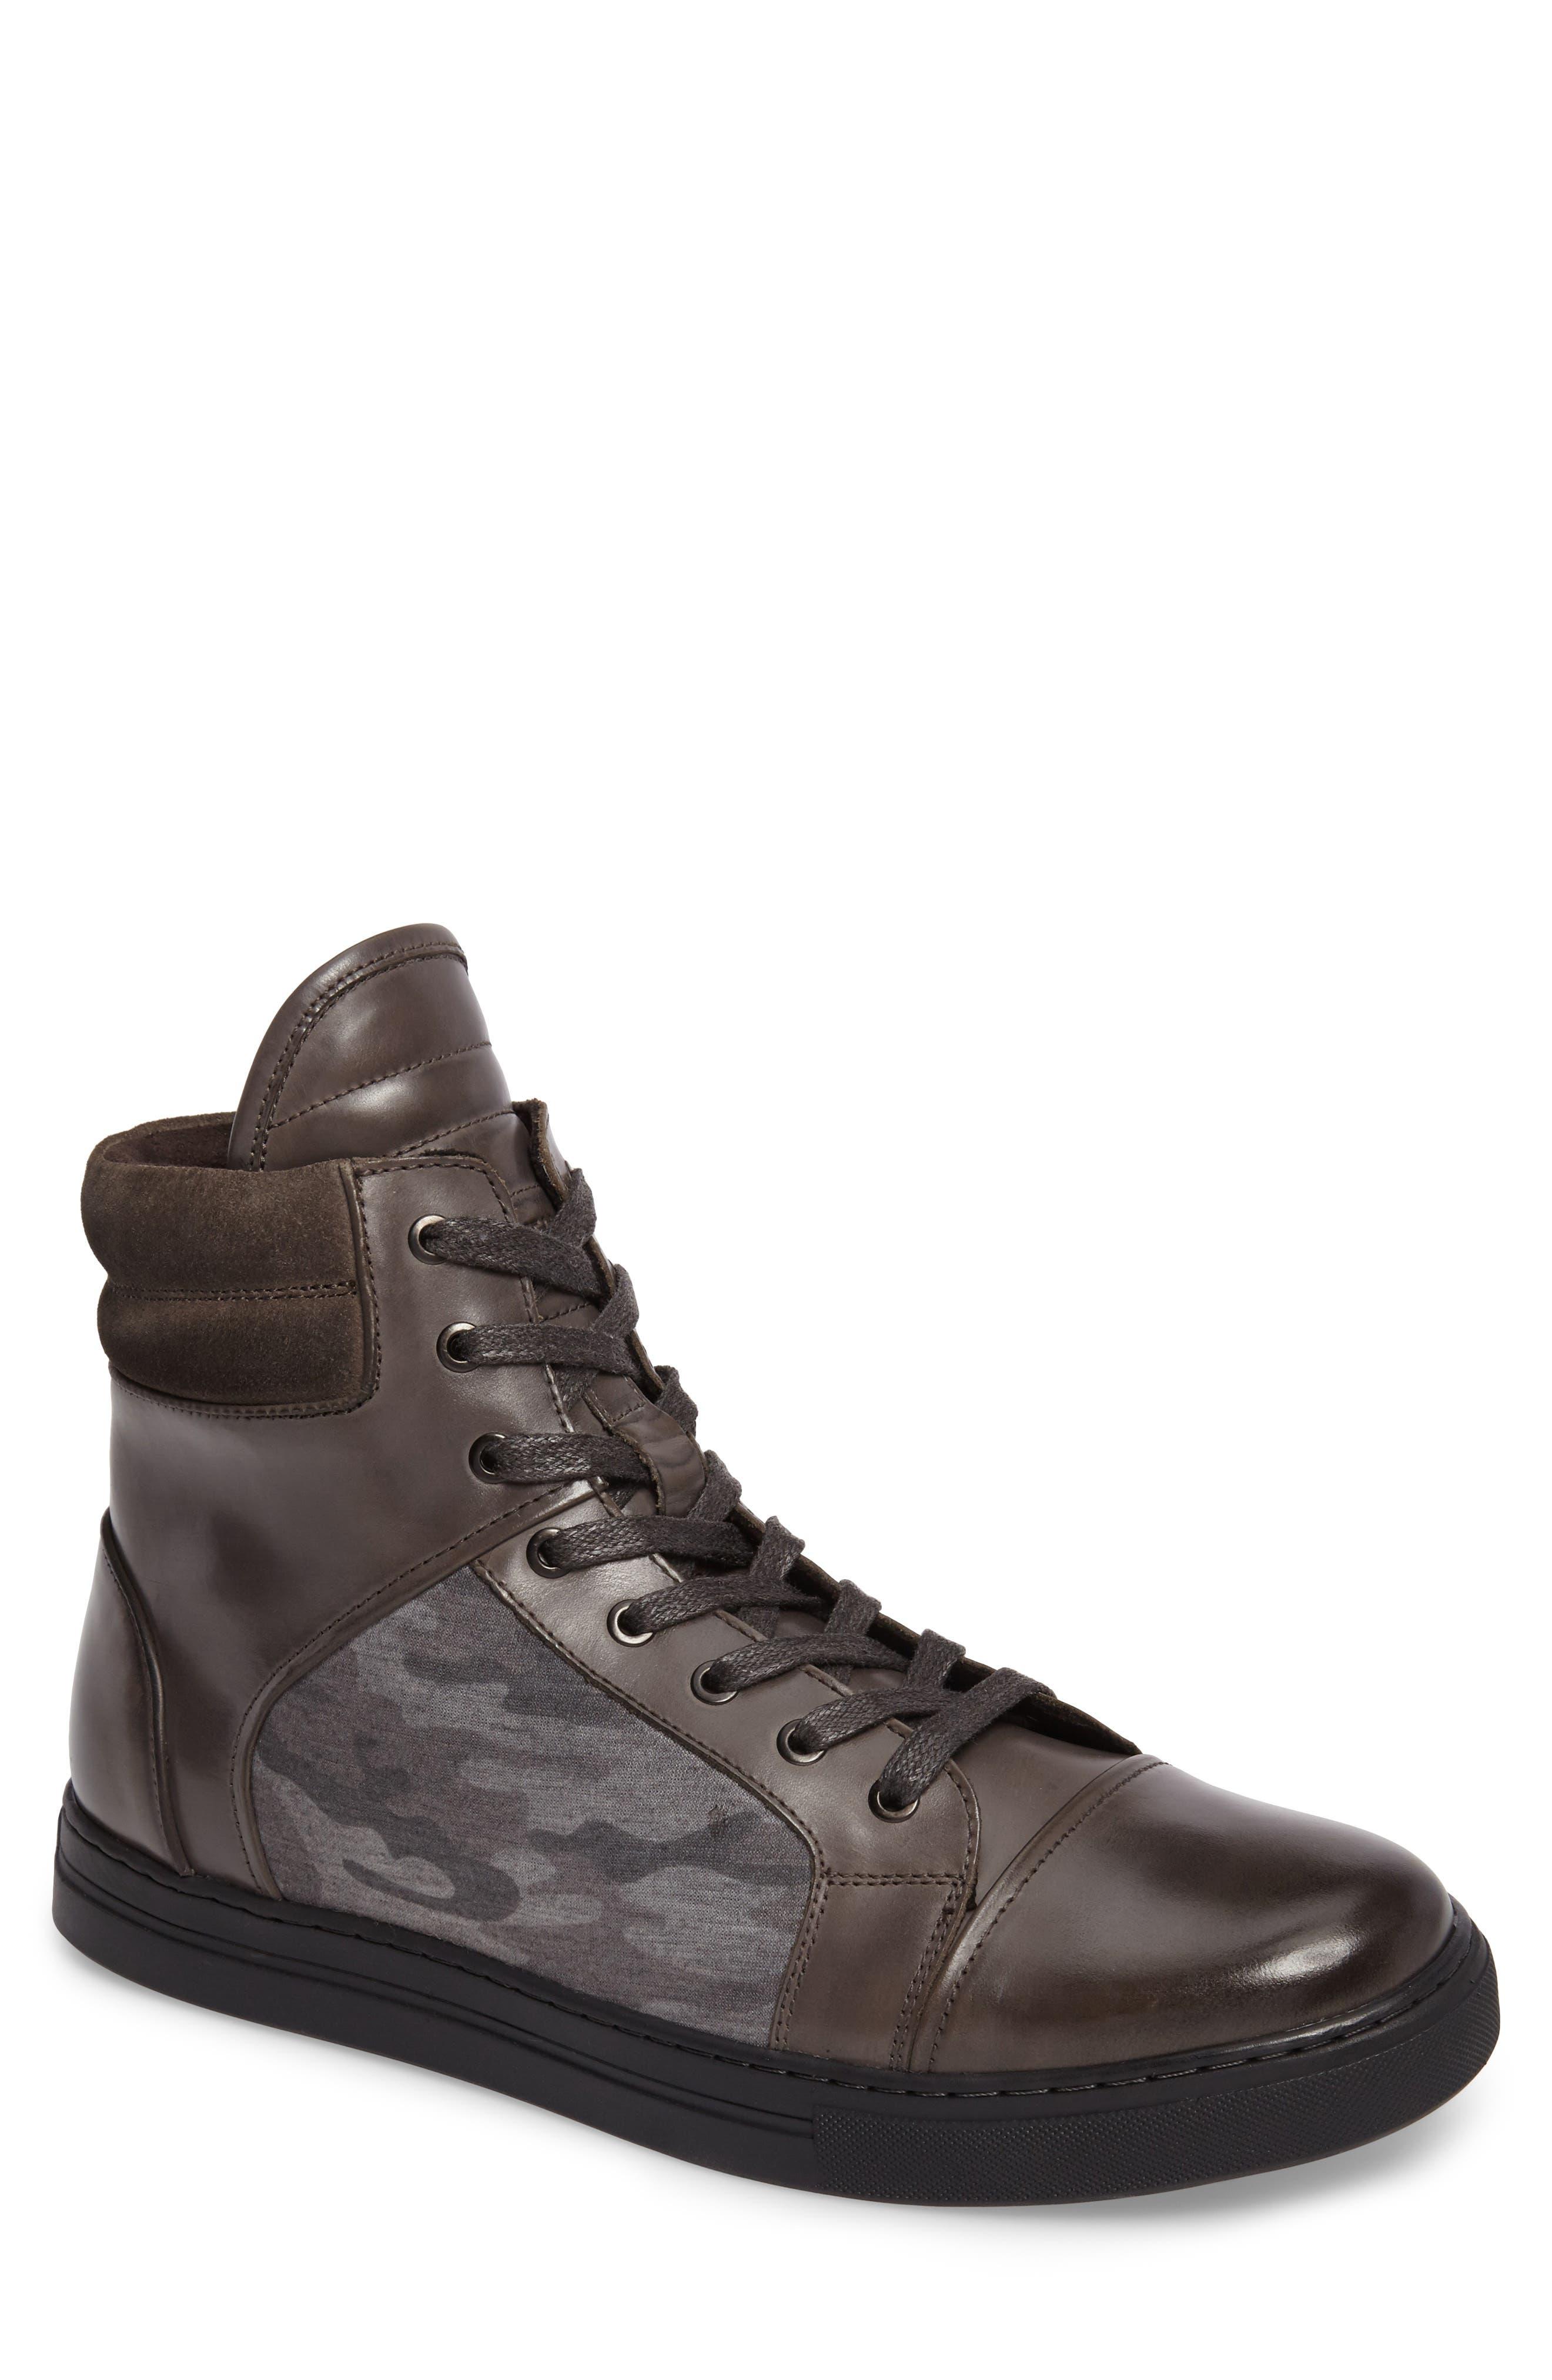 Alternate Image 1 Selected - Kenneth Cole New York Double Header Sneaker (Men)